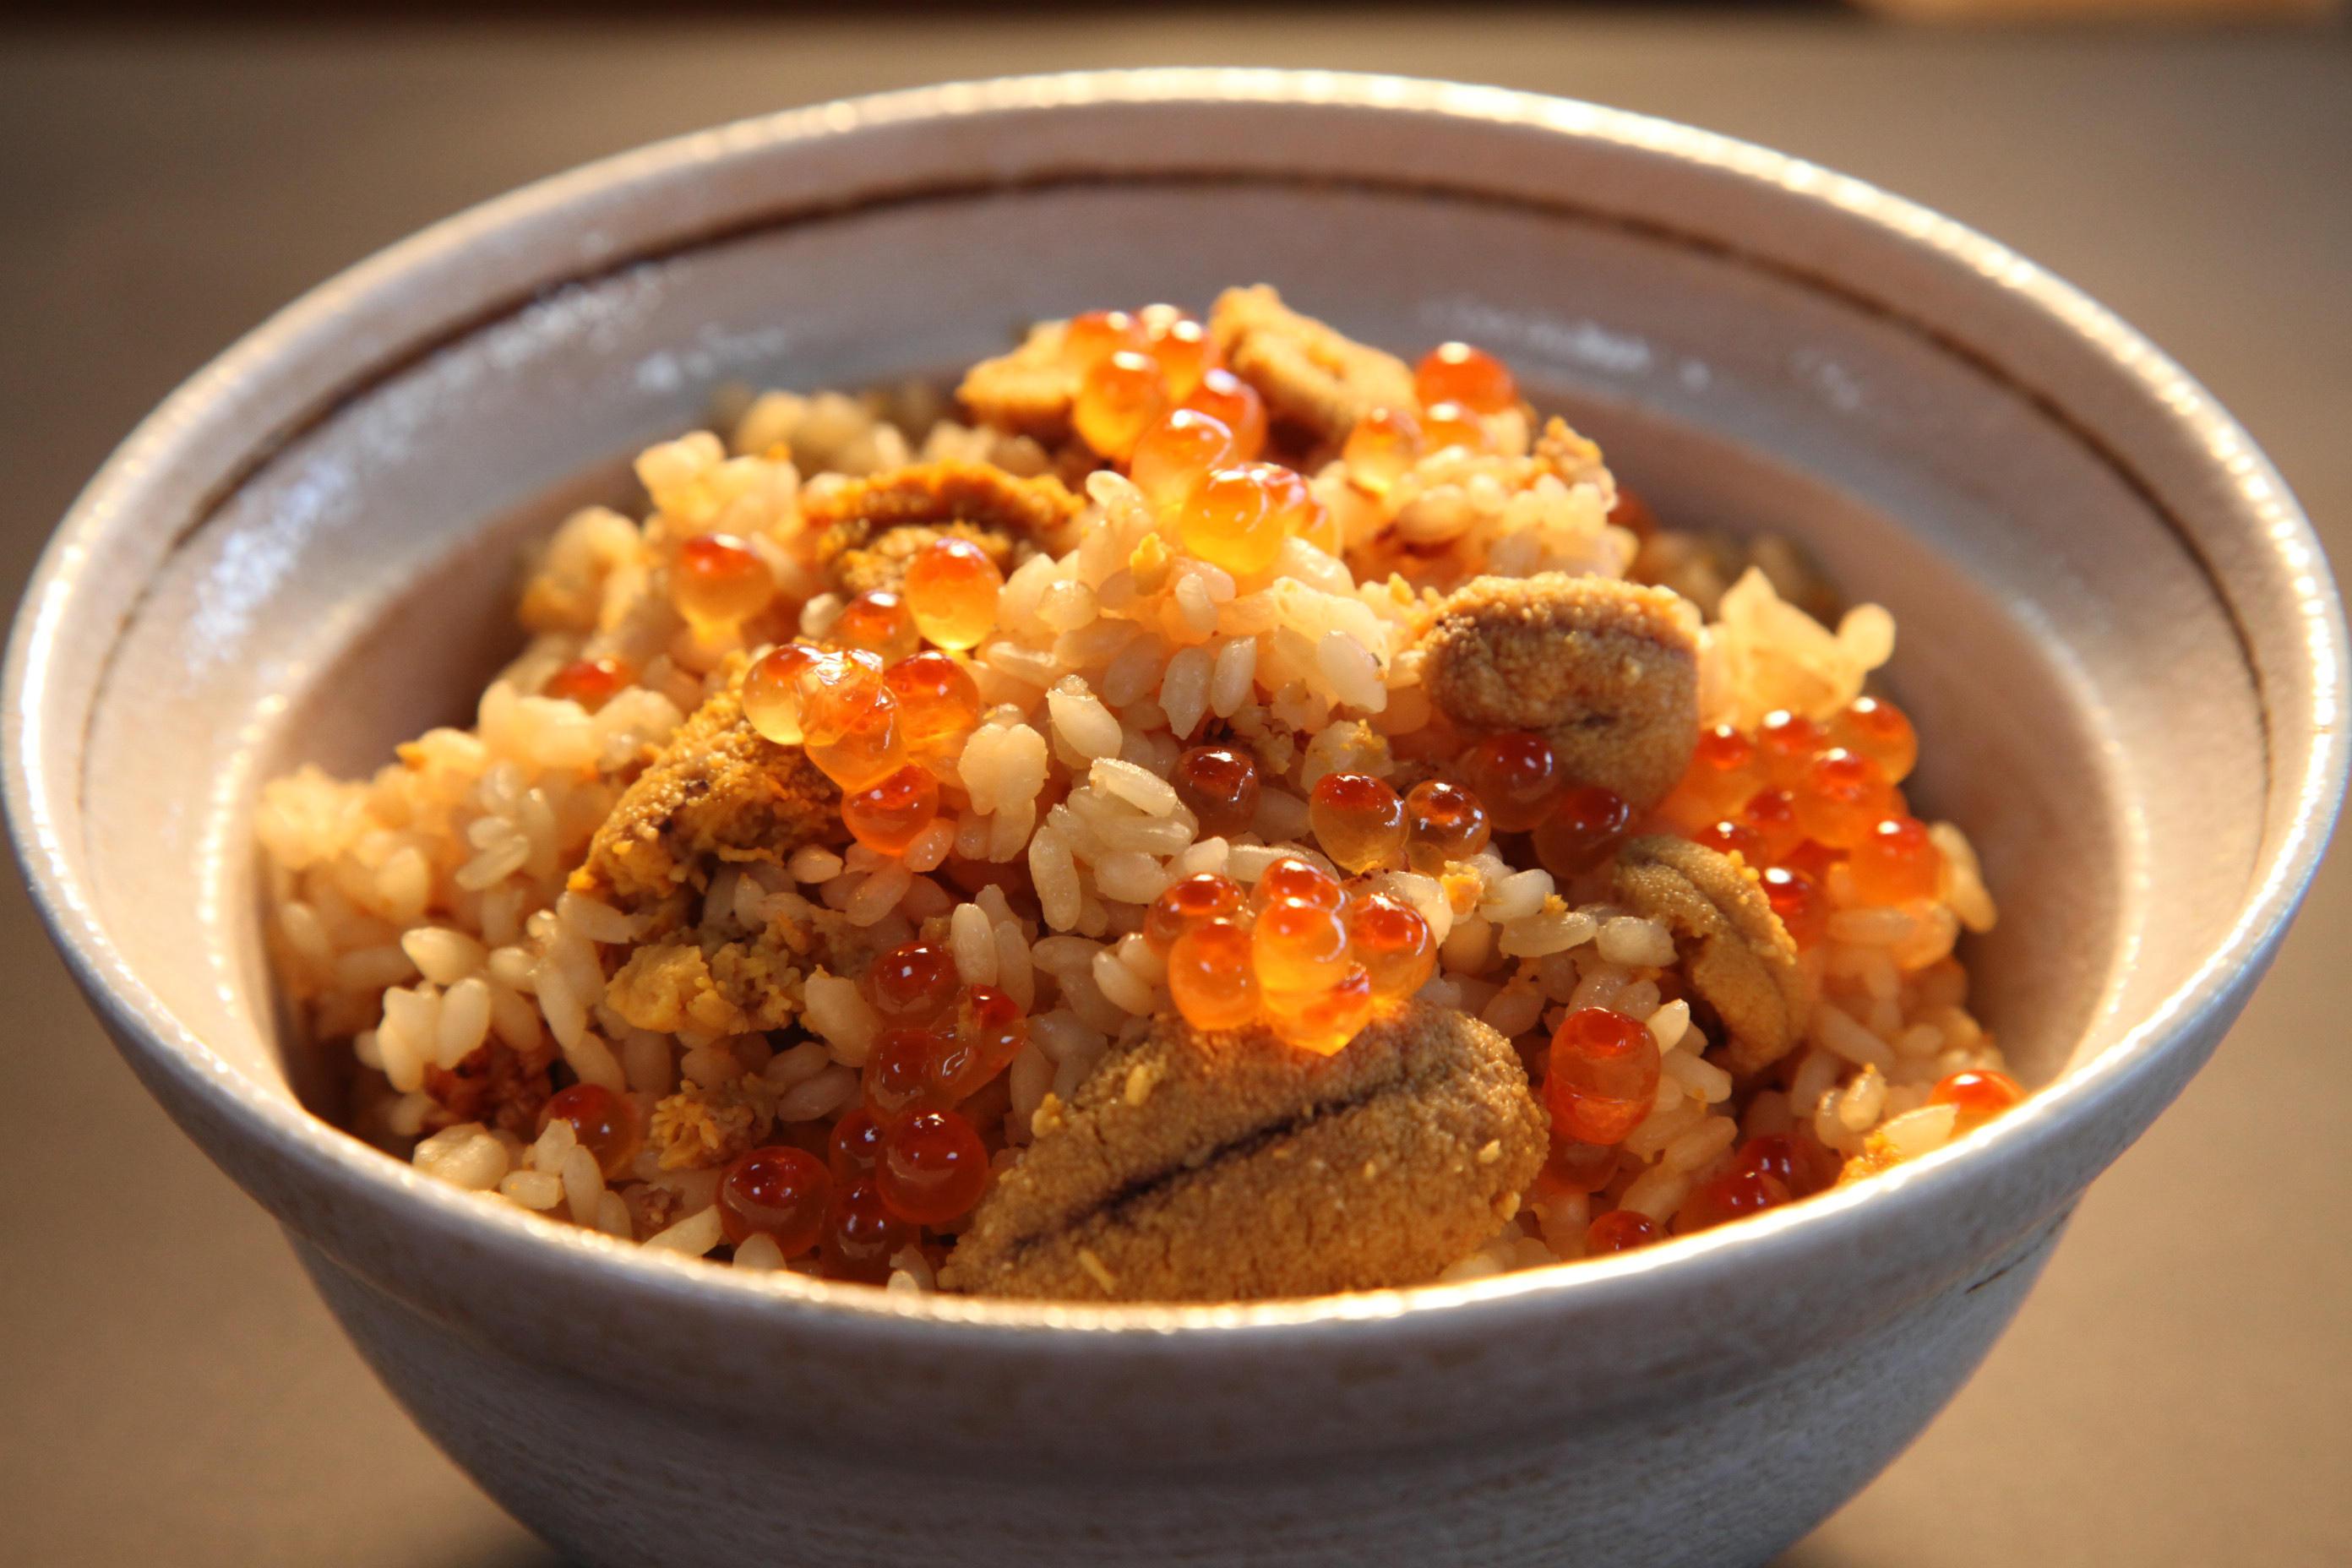 Furusato Matsuri: Japan's Best Food and Culture Festival Celebrates 10th Year